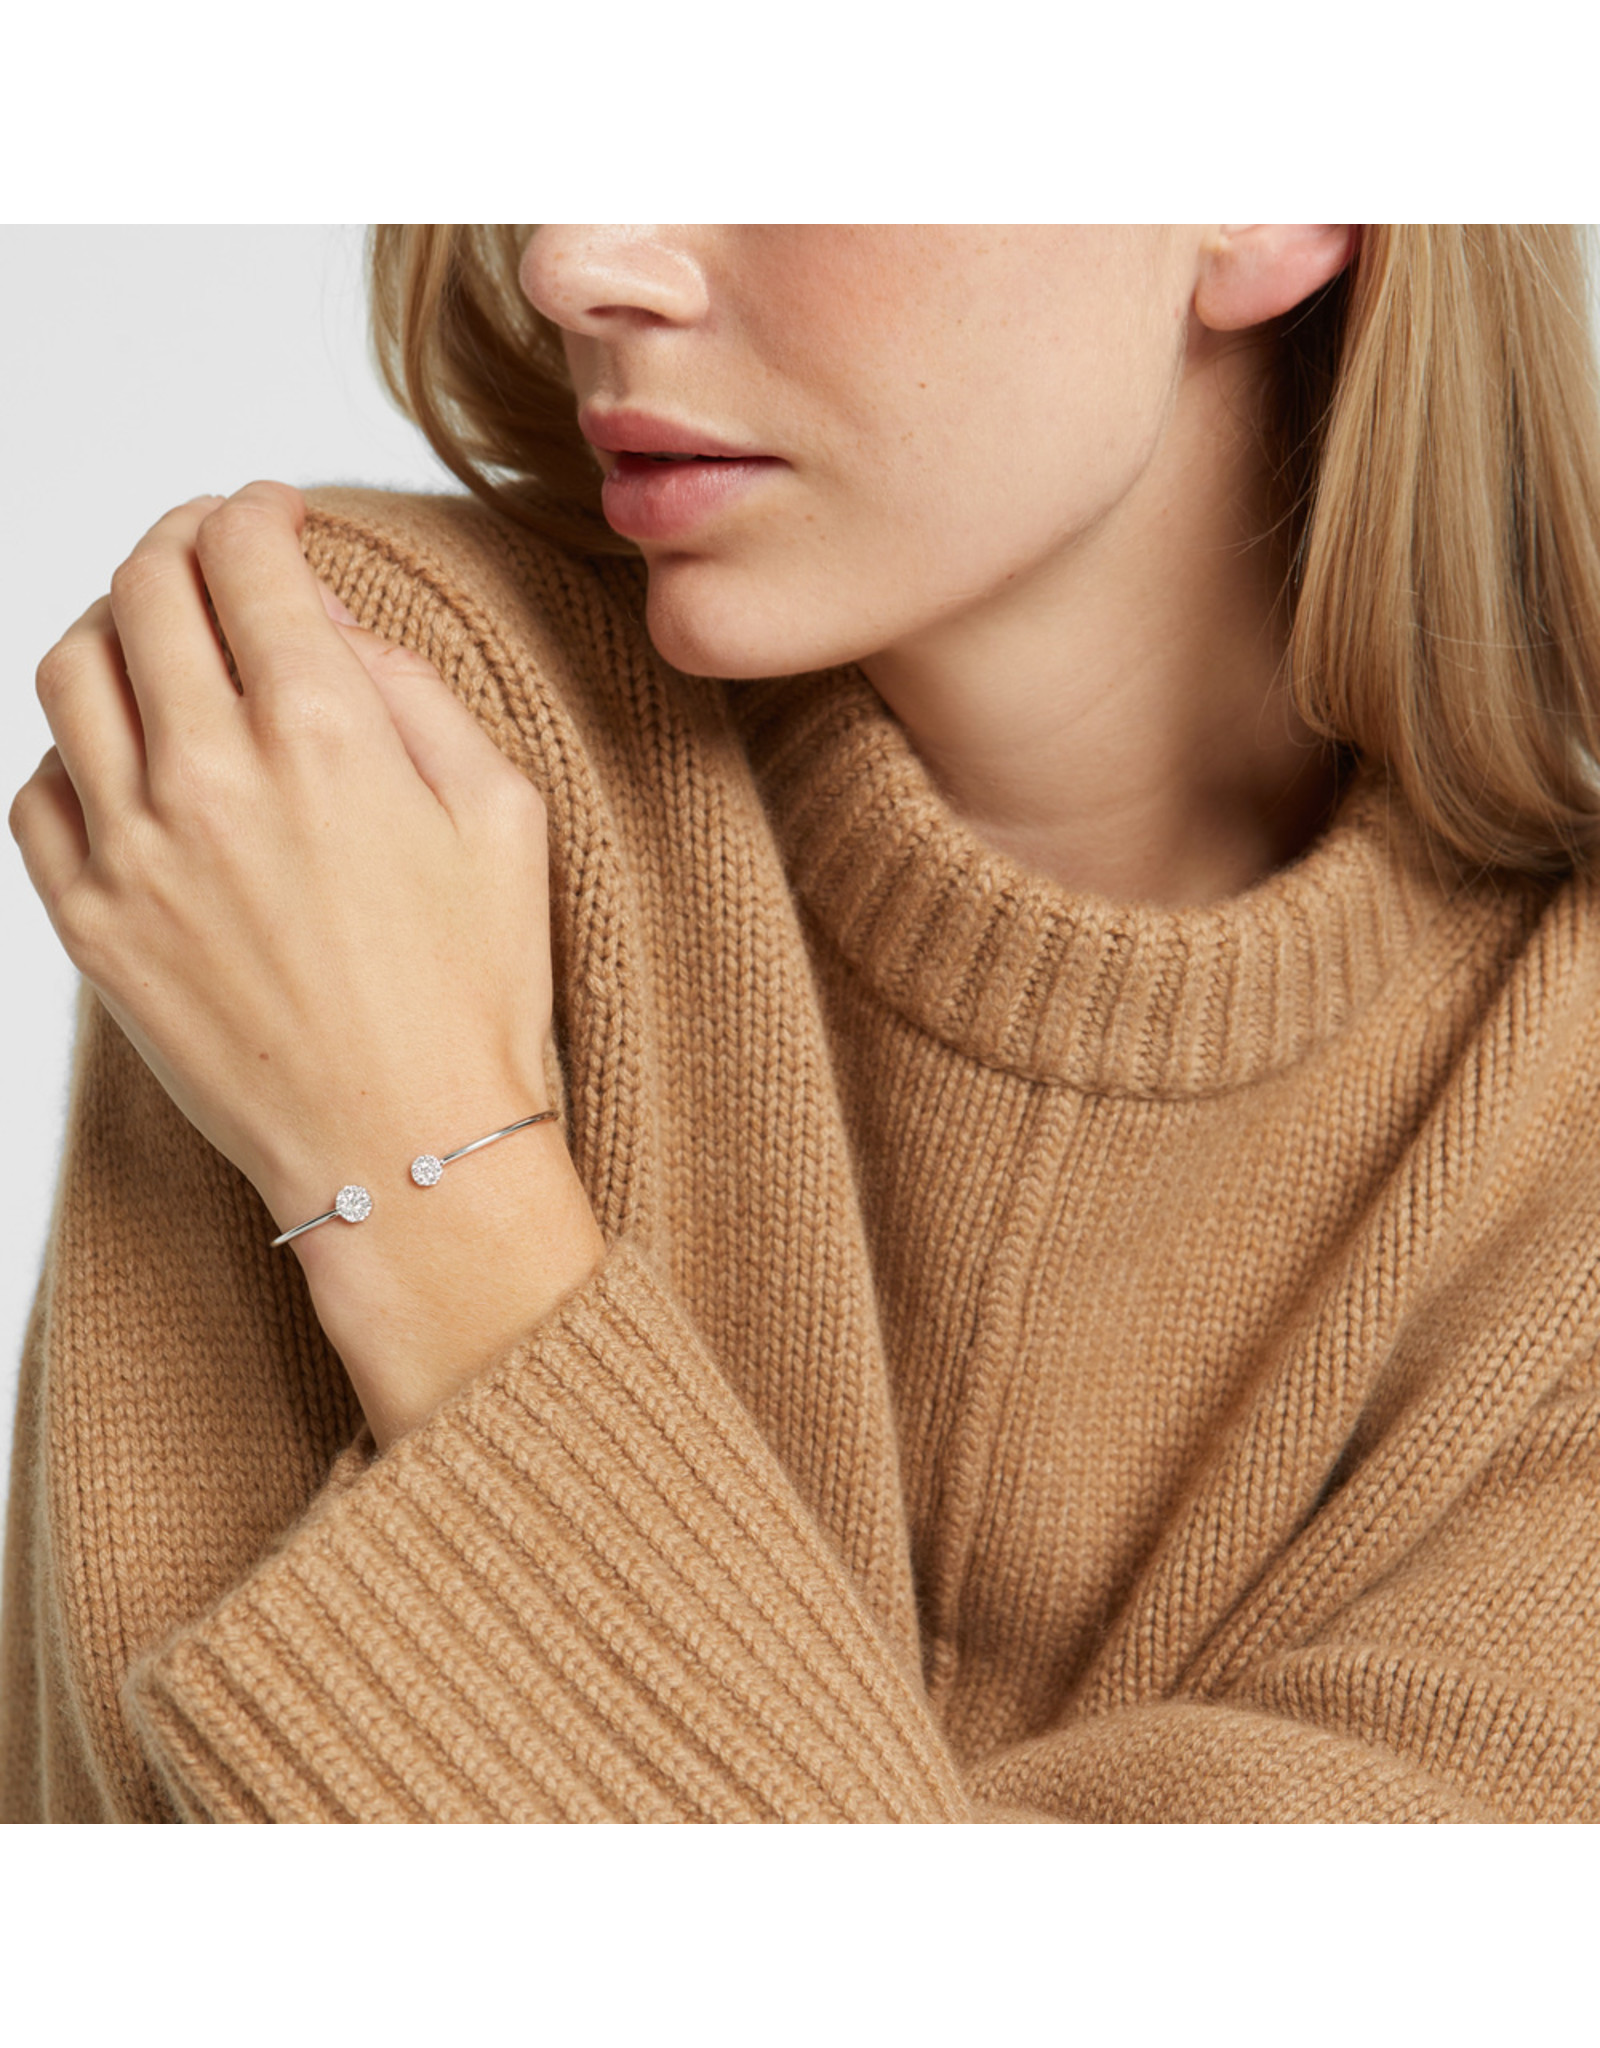 Sara Weinstock Sara Weinstock Reverie Round Cluster Bangle Cuff - White Gold